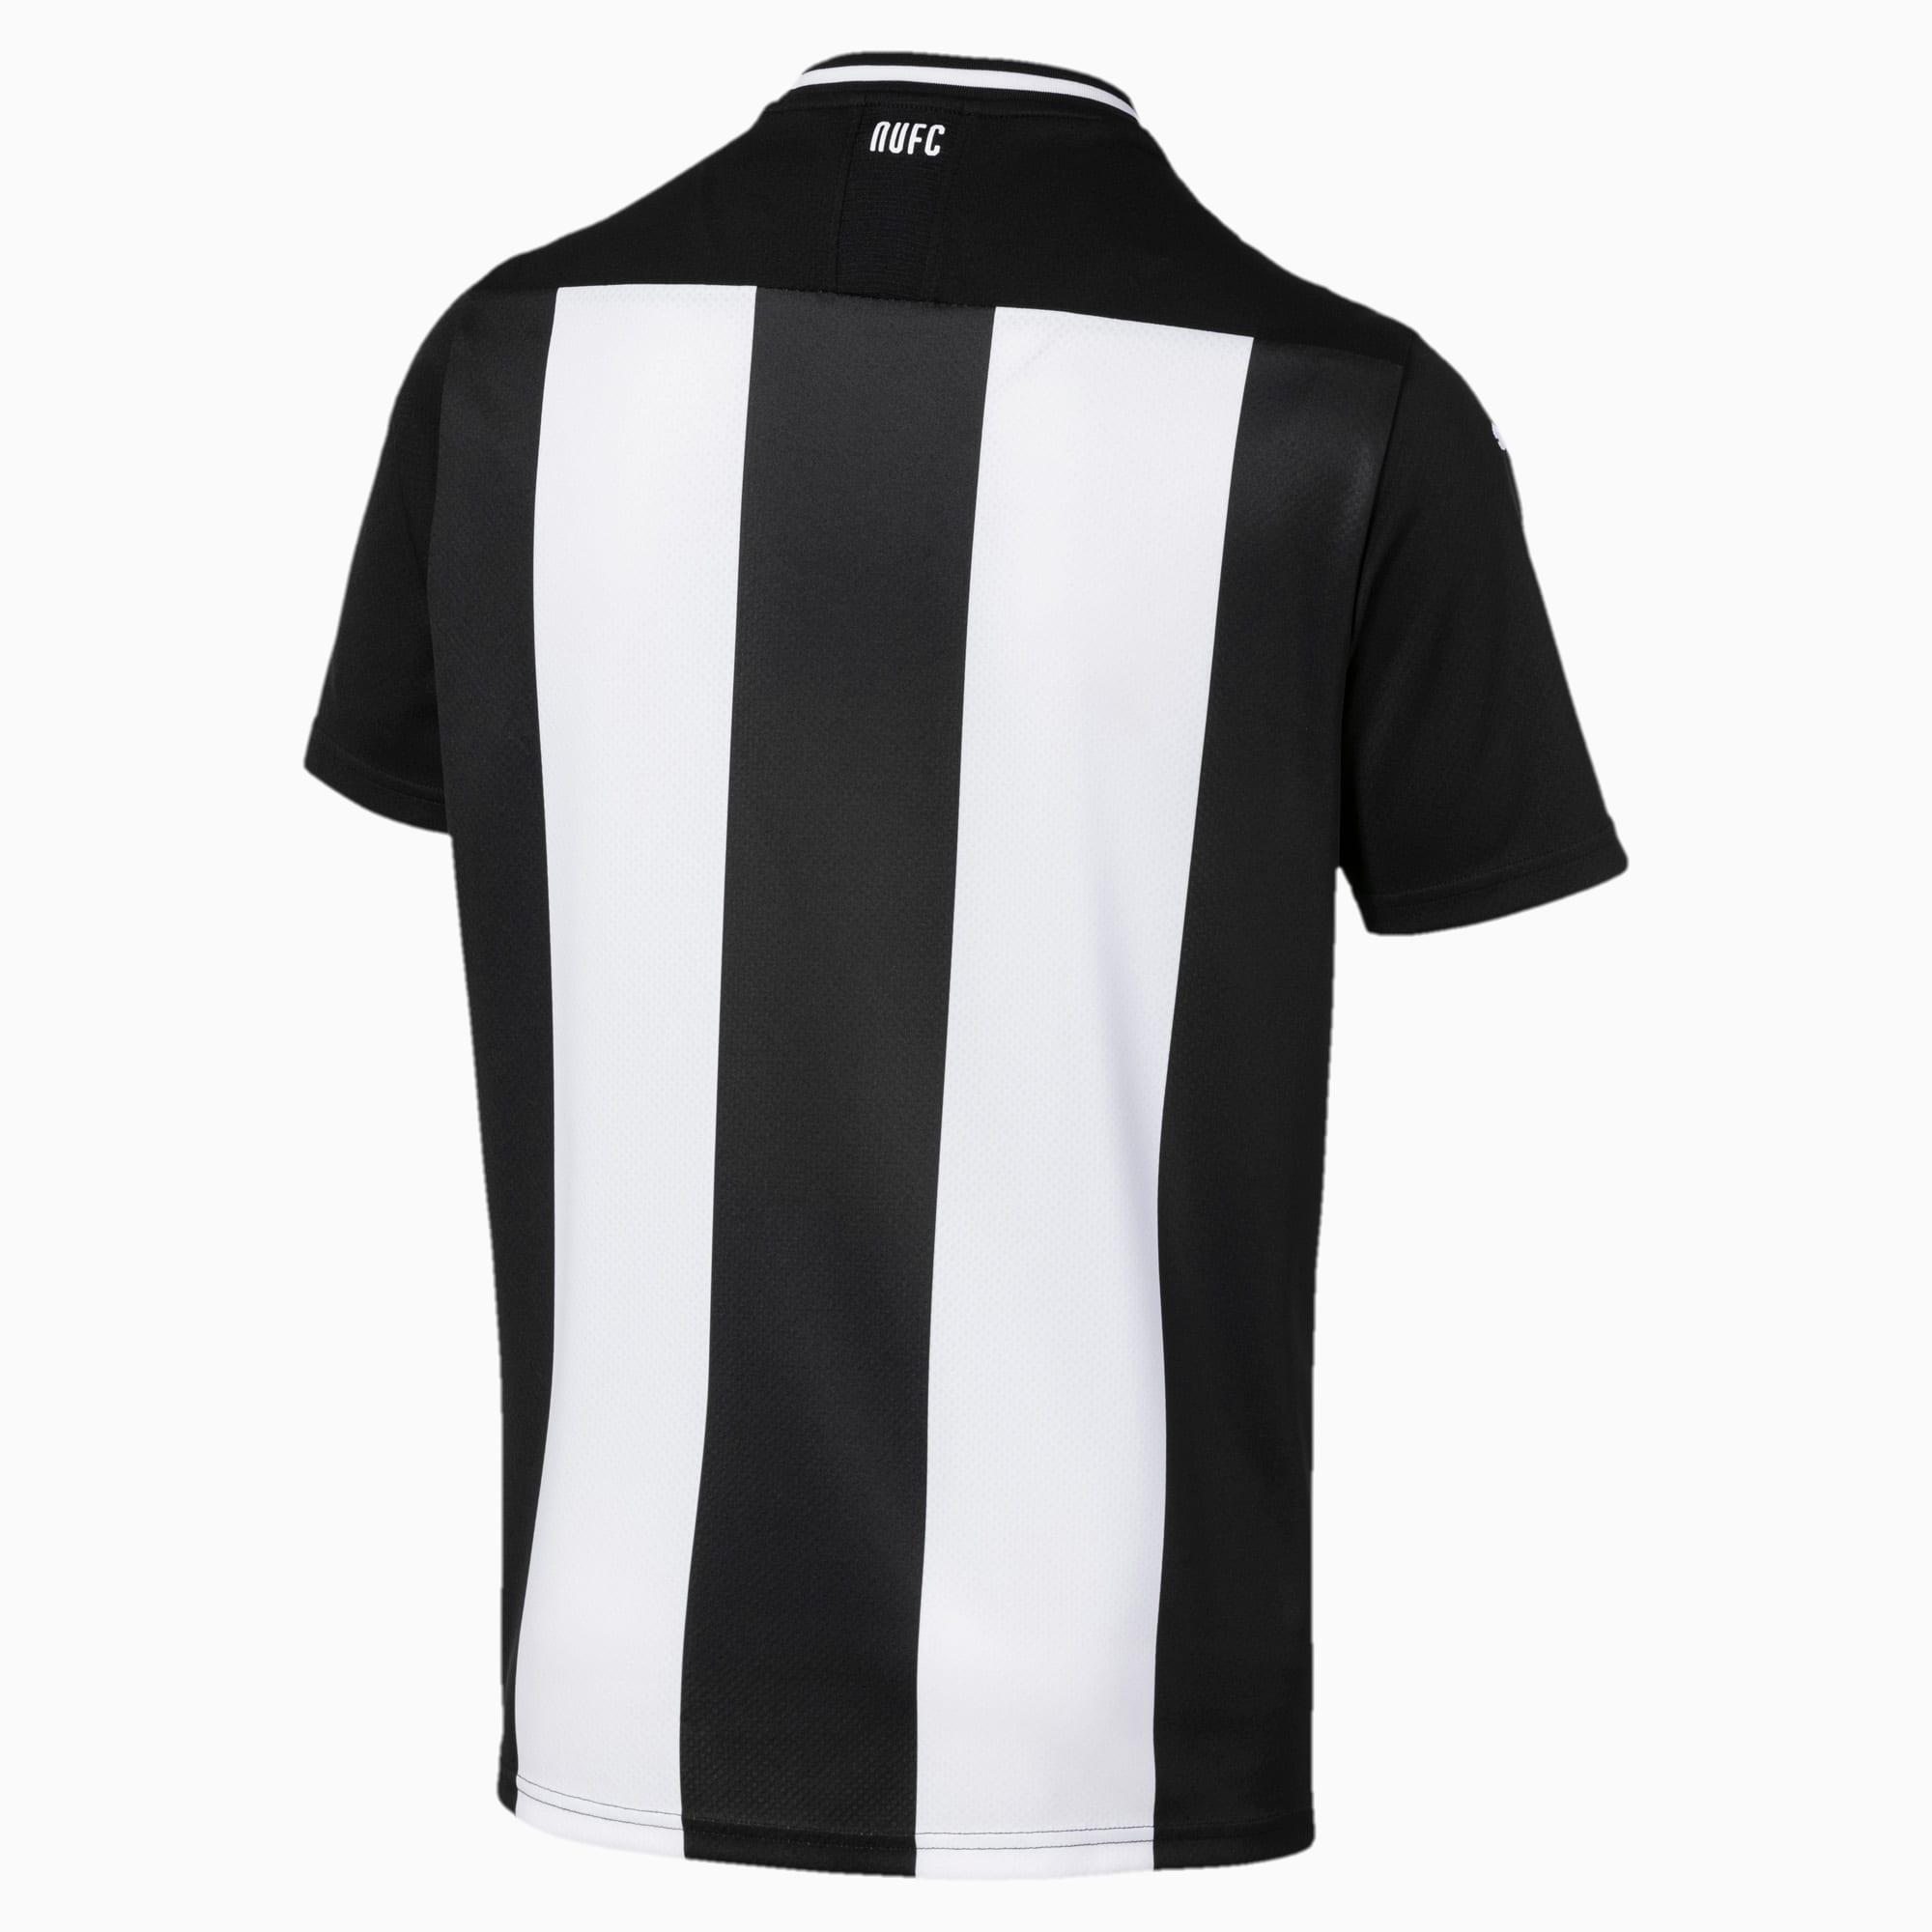 Puma Newcastle United Mens Third Football Shirt NUFC Newcastle Top